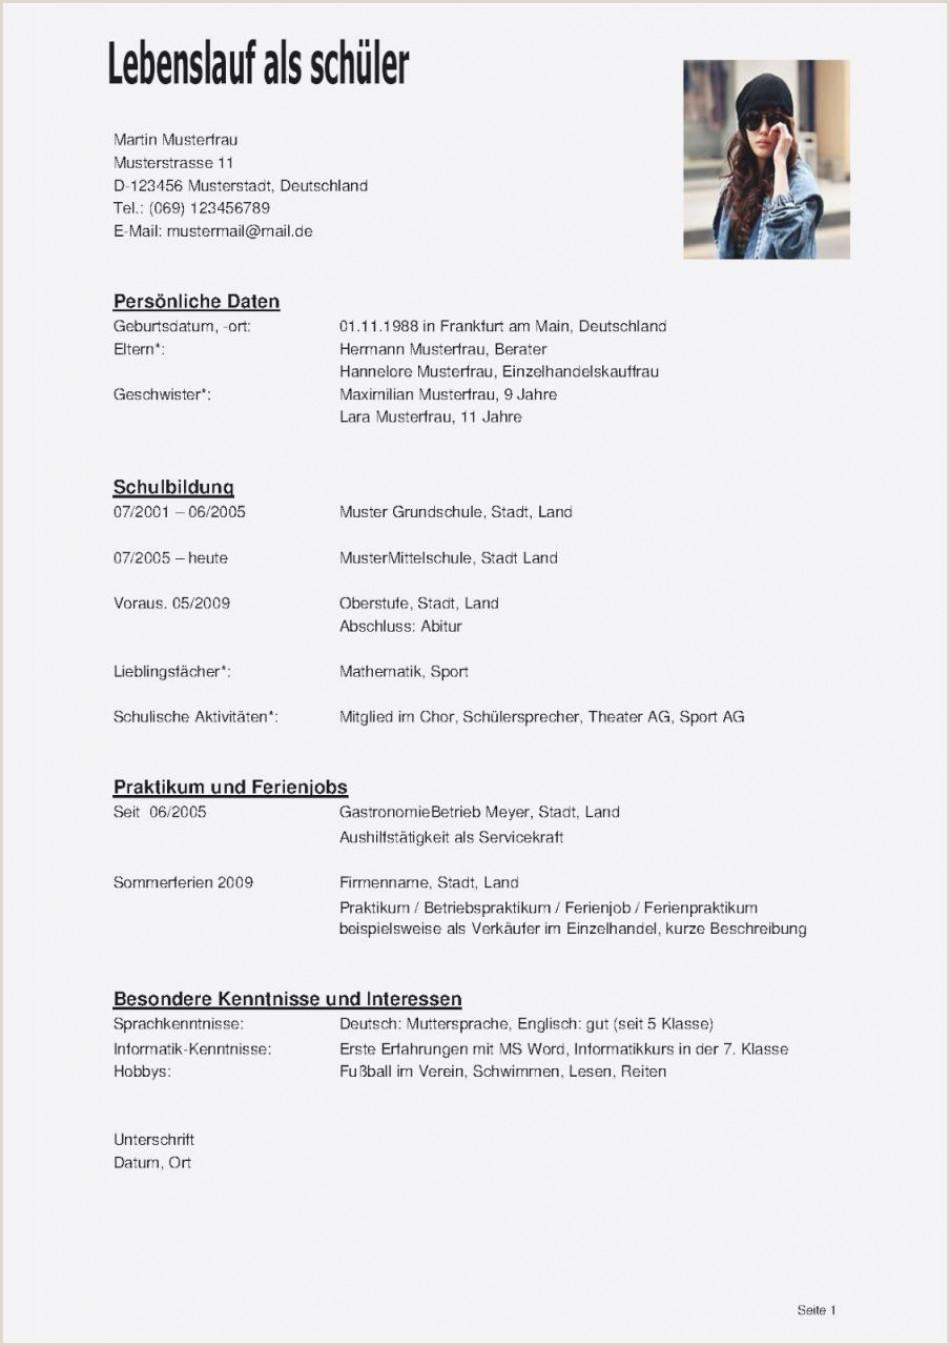 Lebenslauf Muster Latex 17 Latex Lebenslauf Vorlage